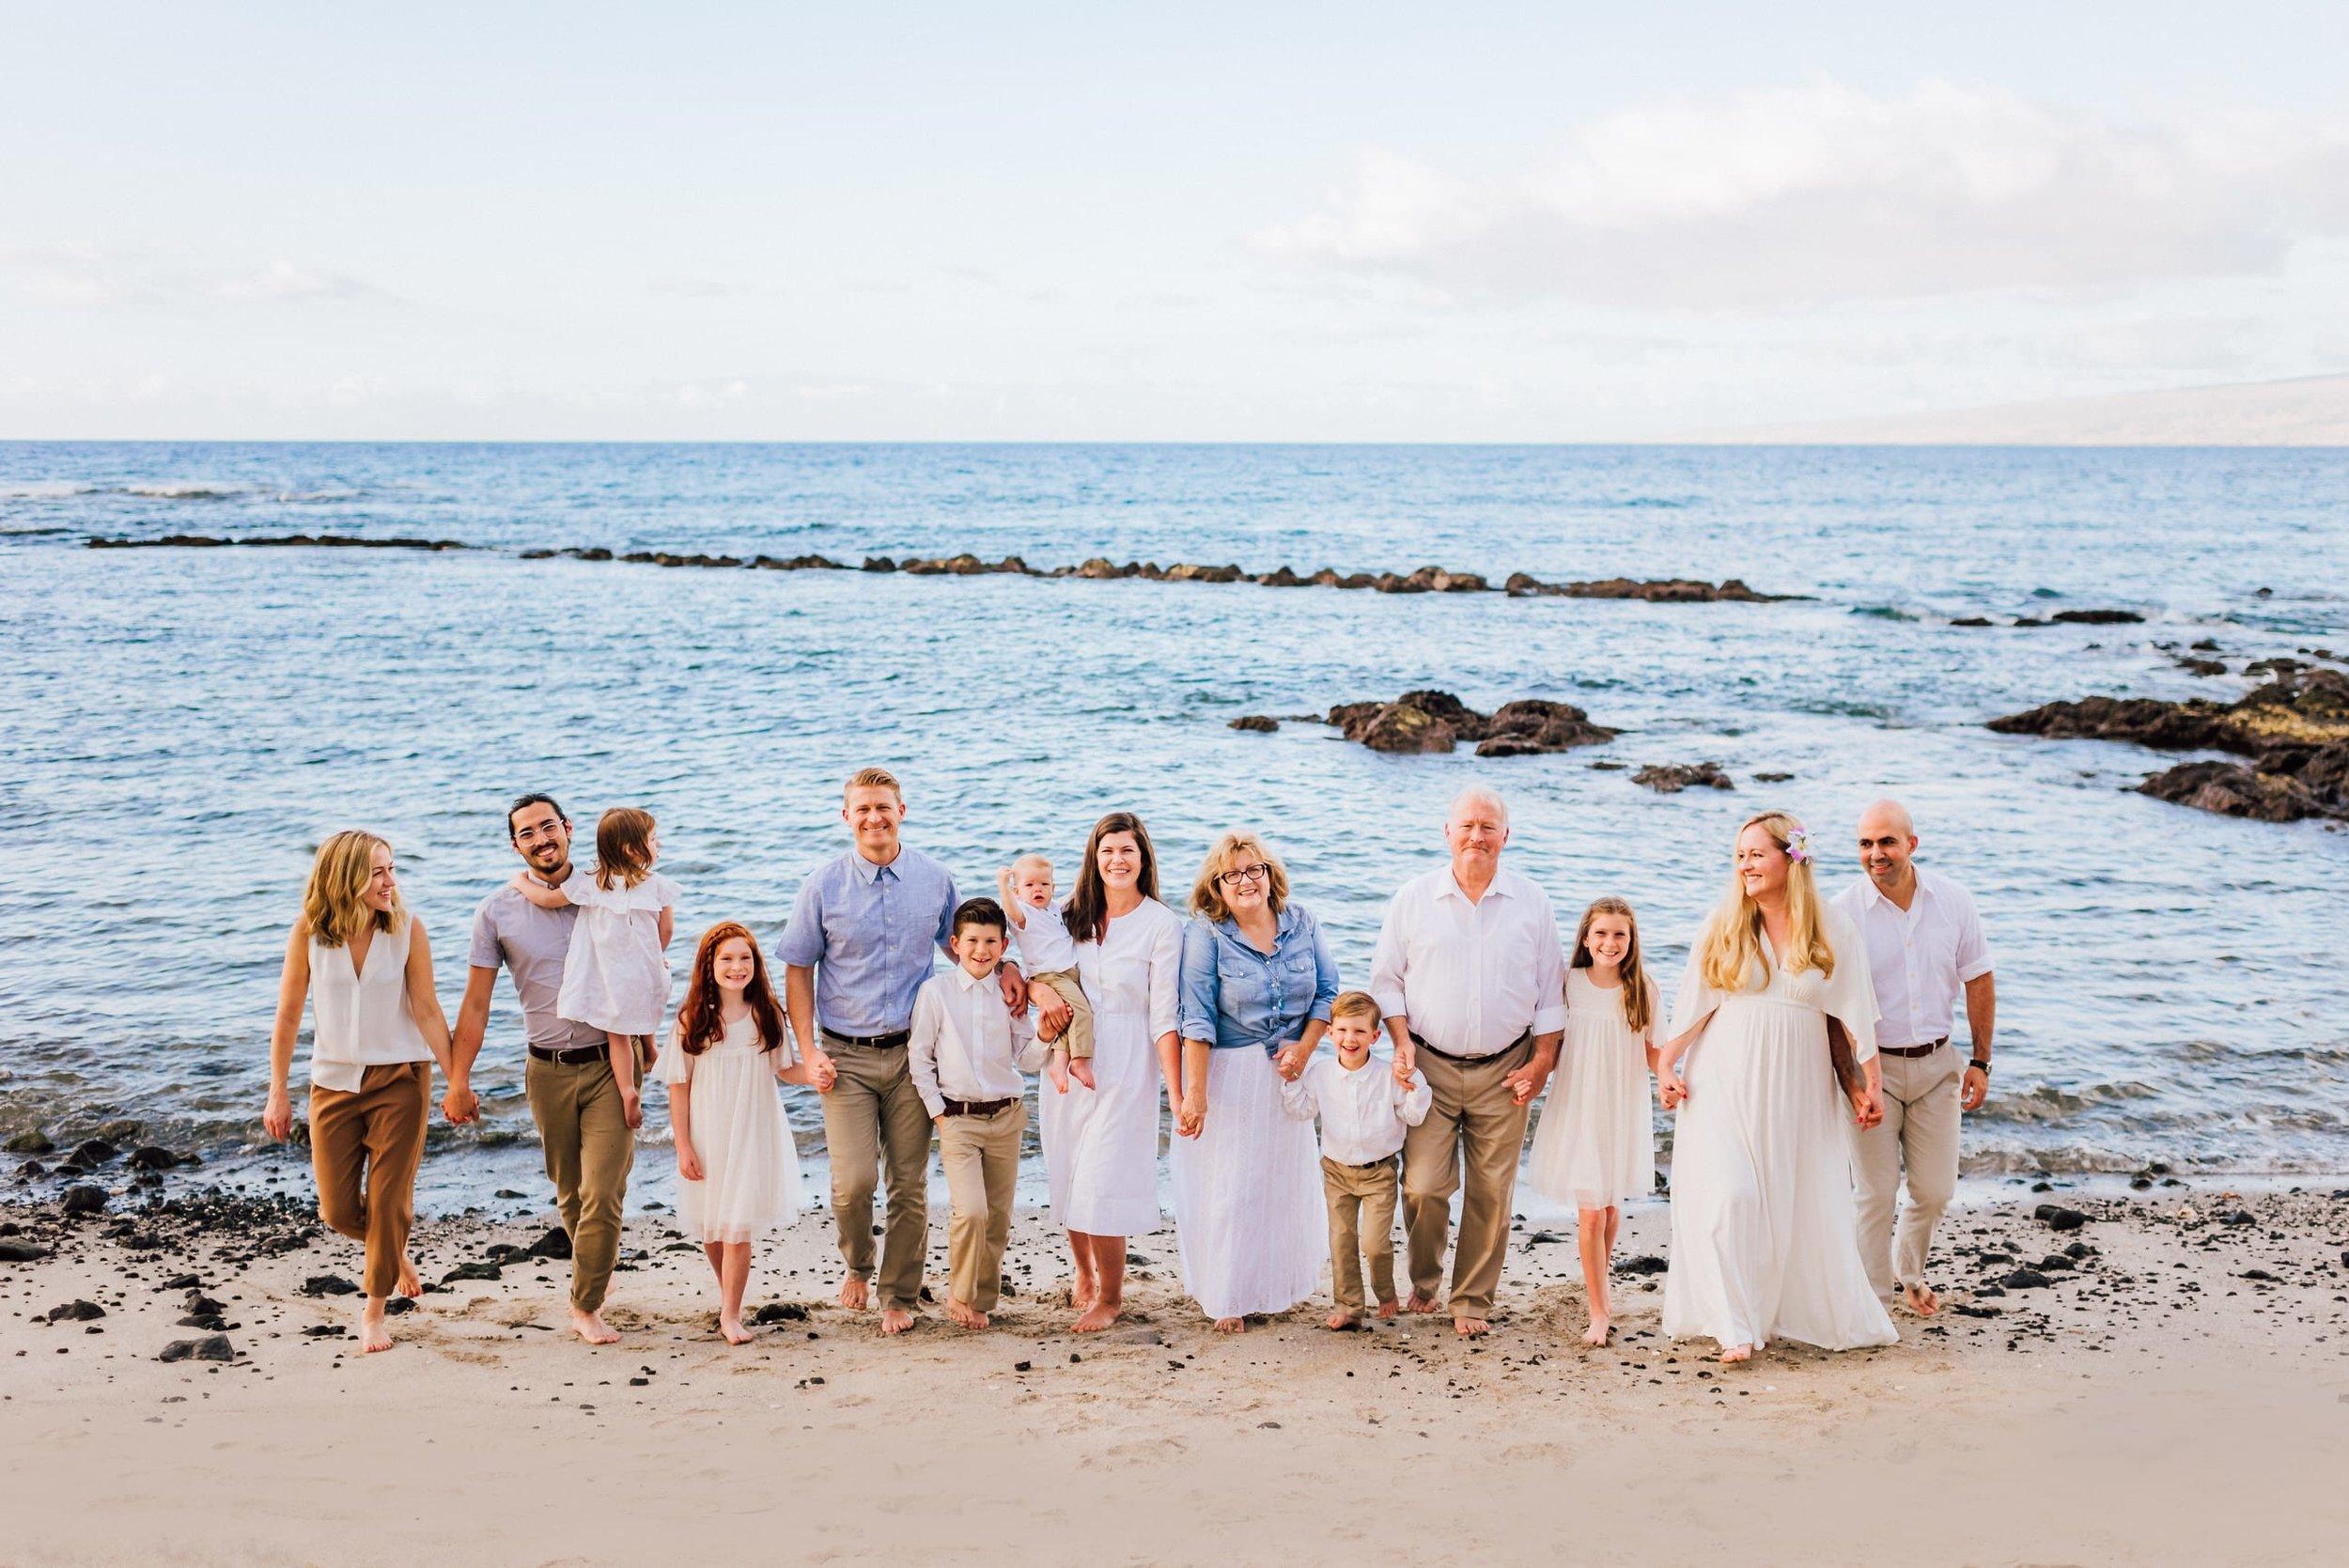 Hawaii-Family-Photographer-Waikoloa-Fairmont-Hualalai-Mauna-Kea-3.jpg